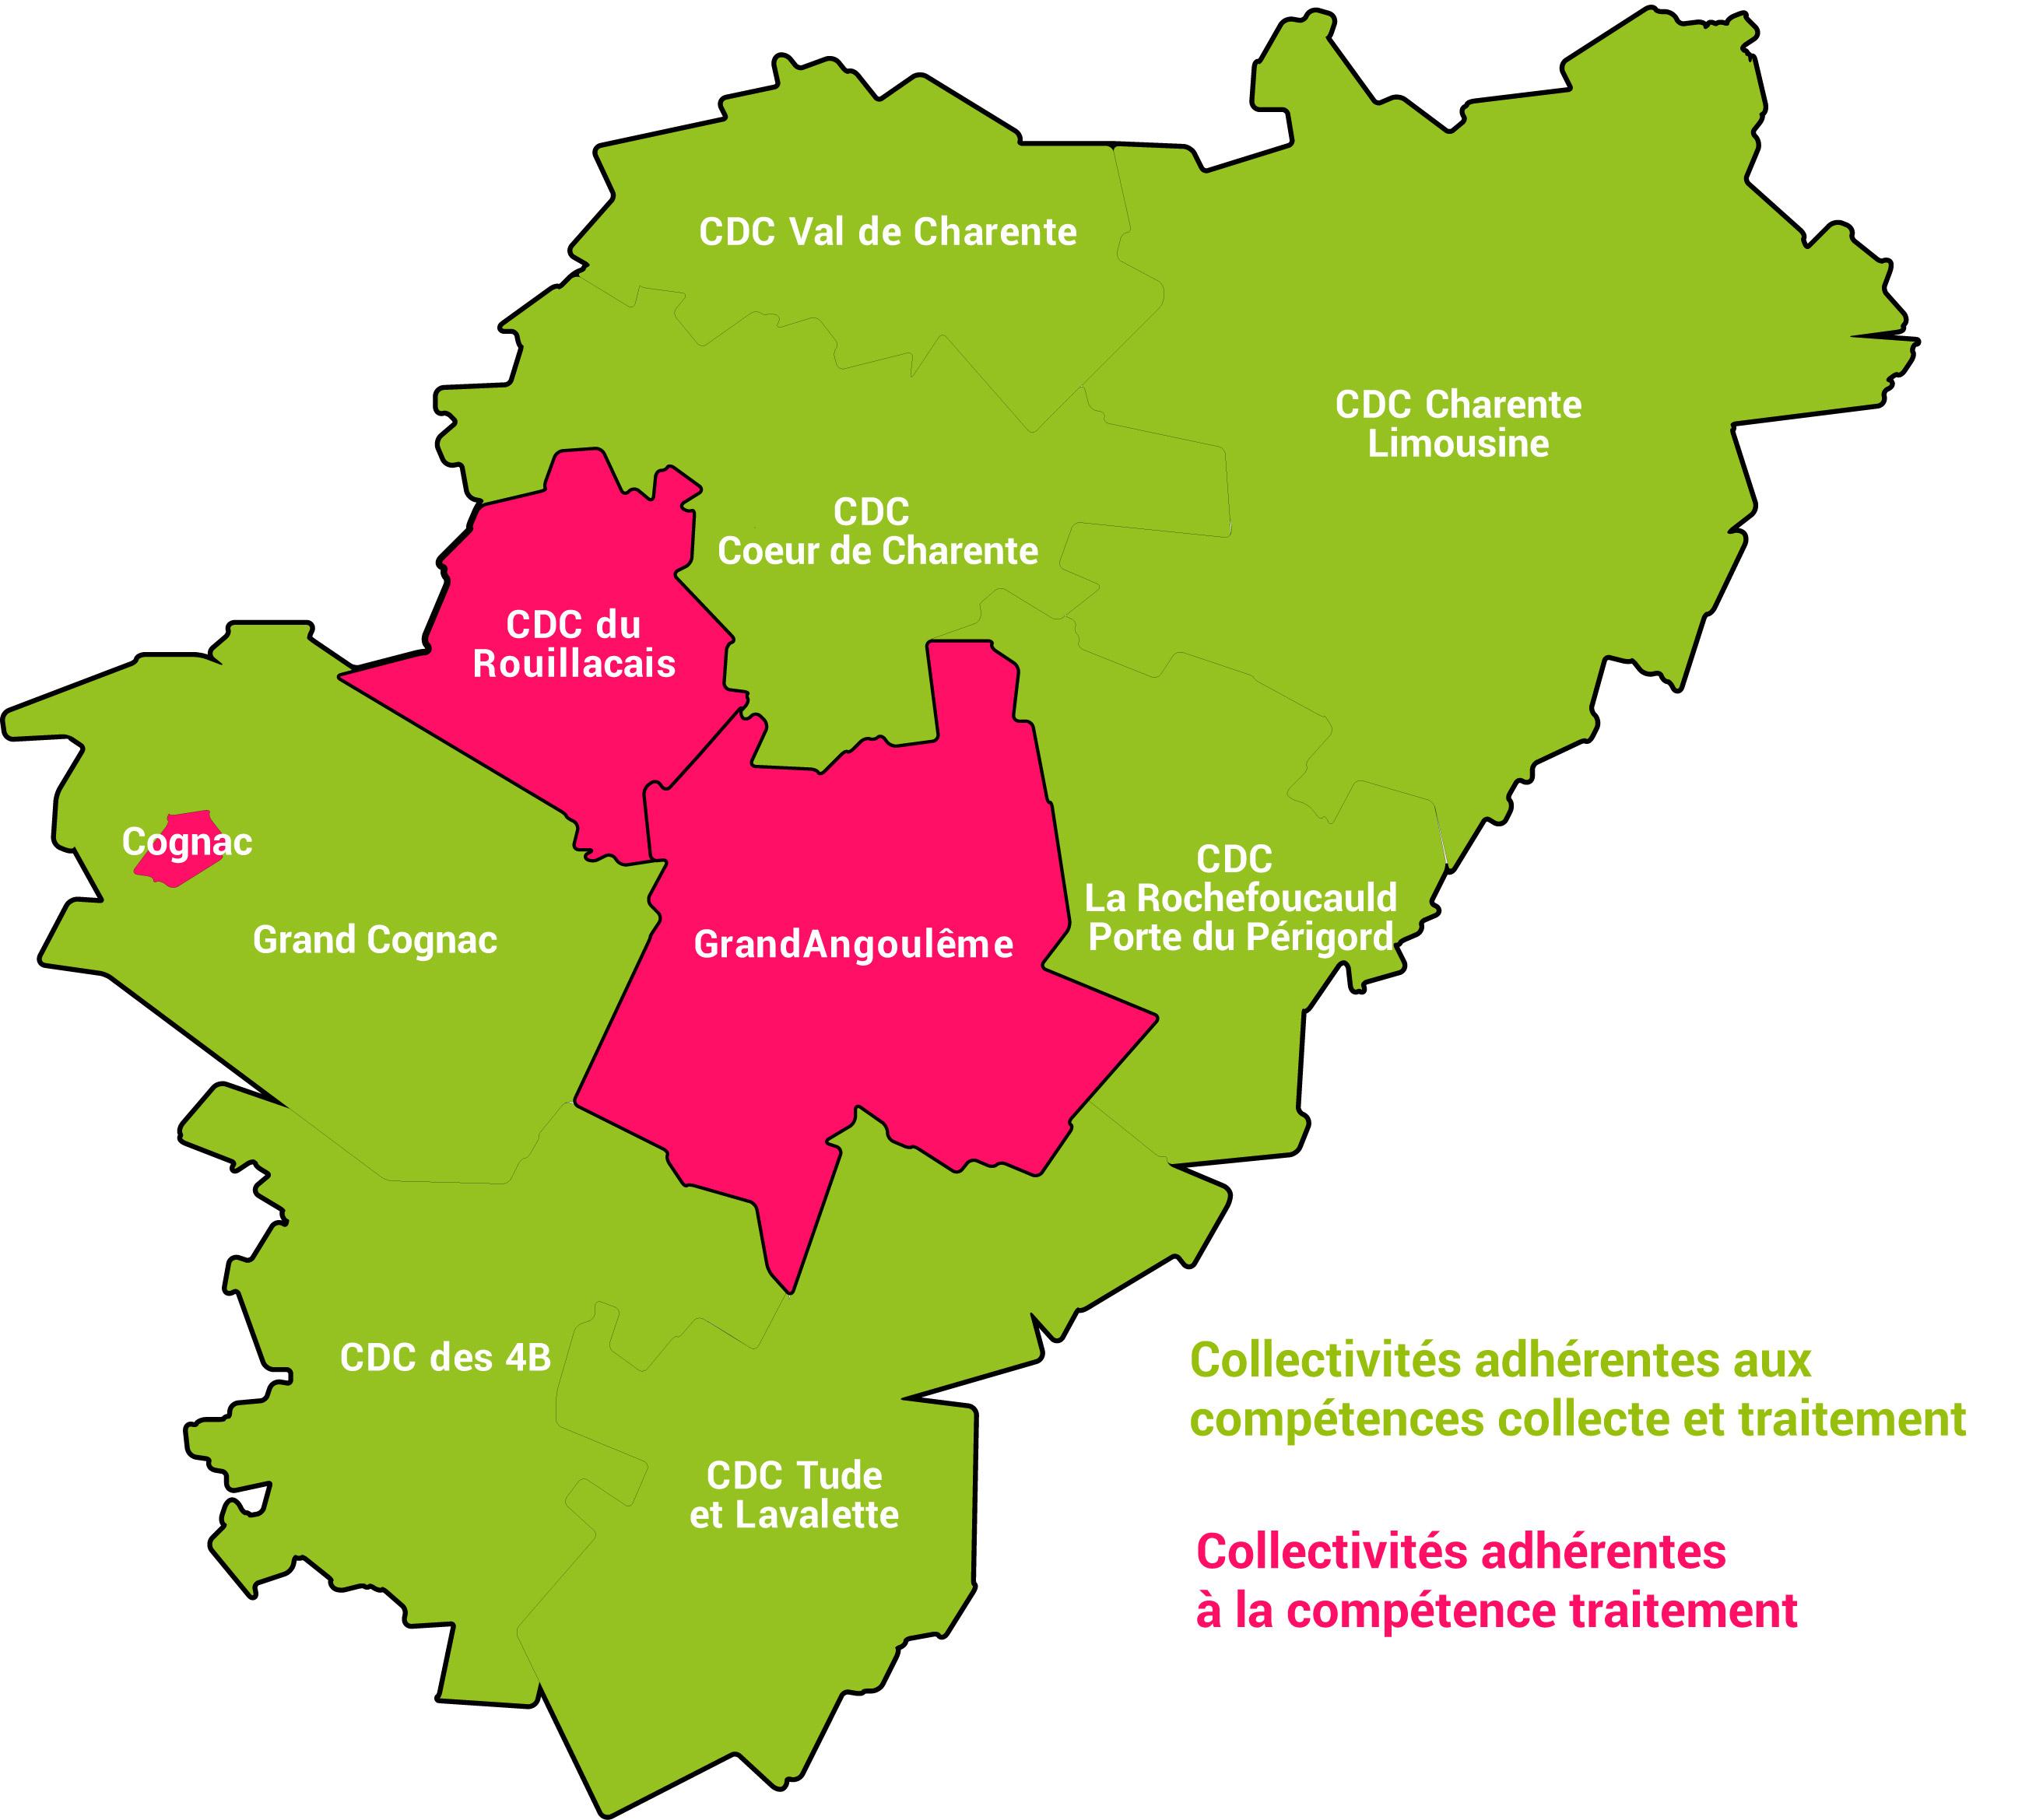 carte des collectivites adherentes